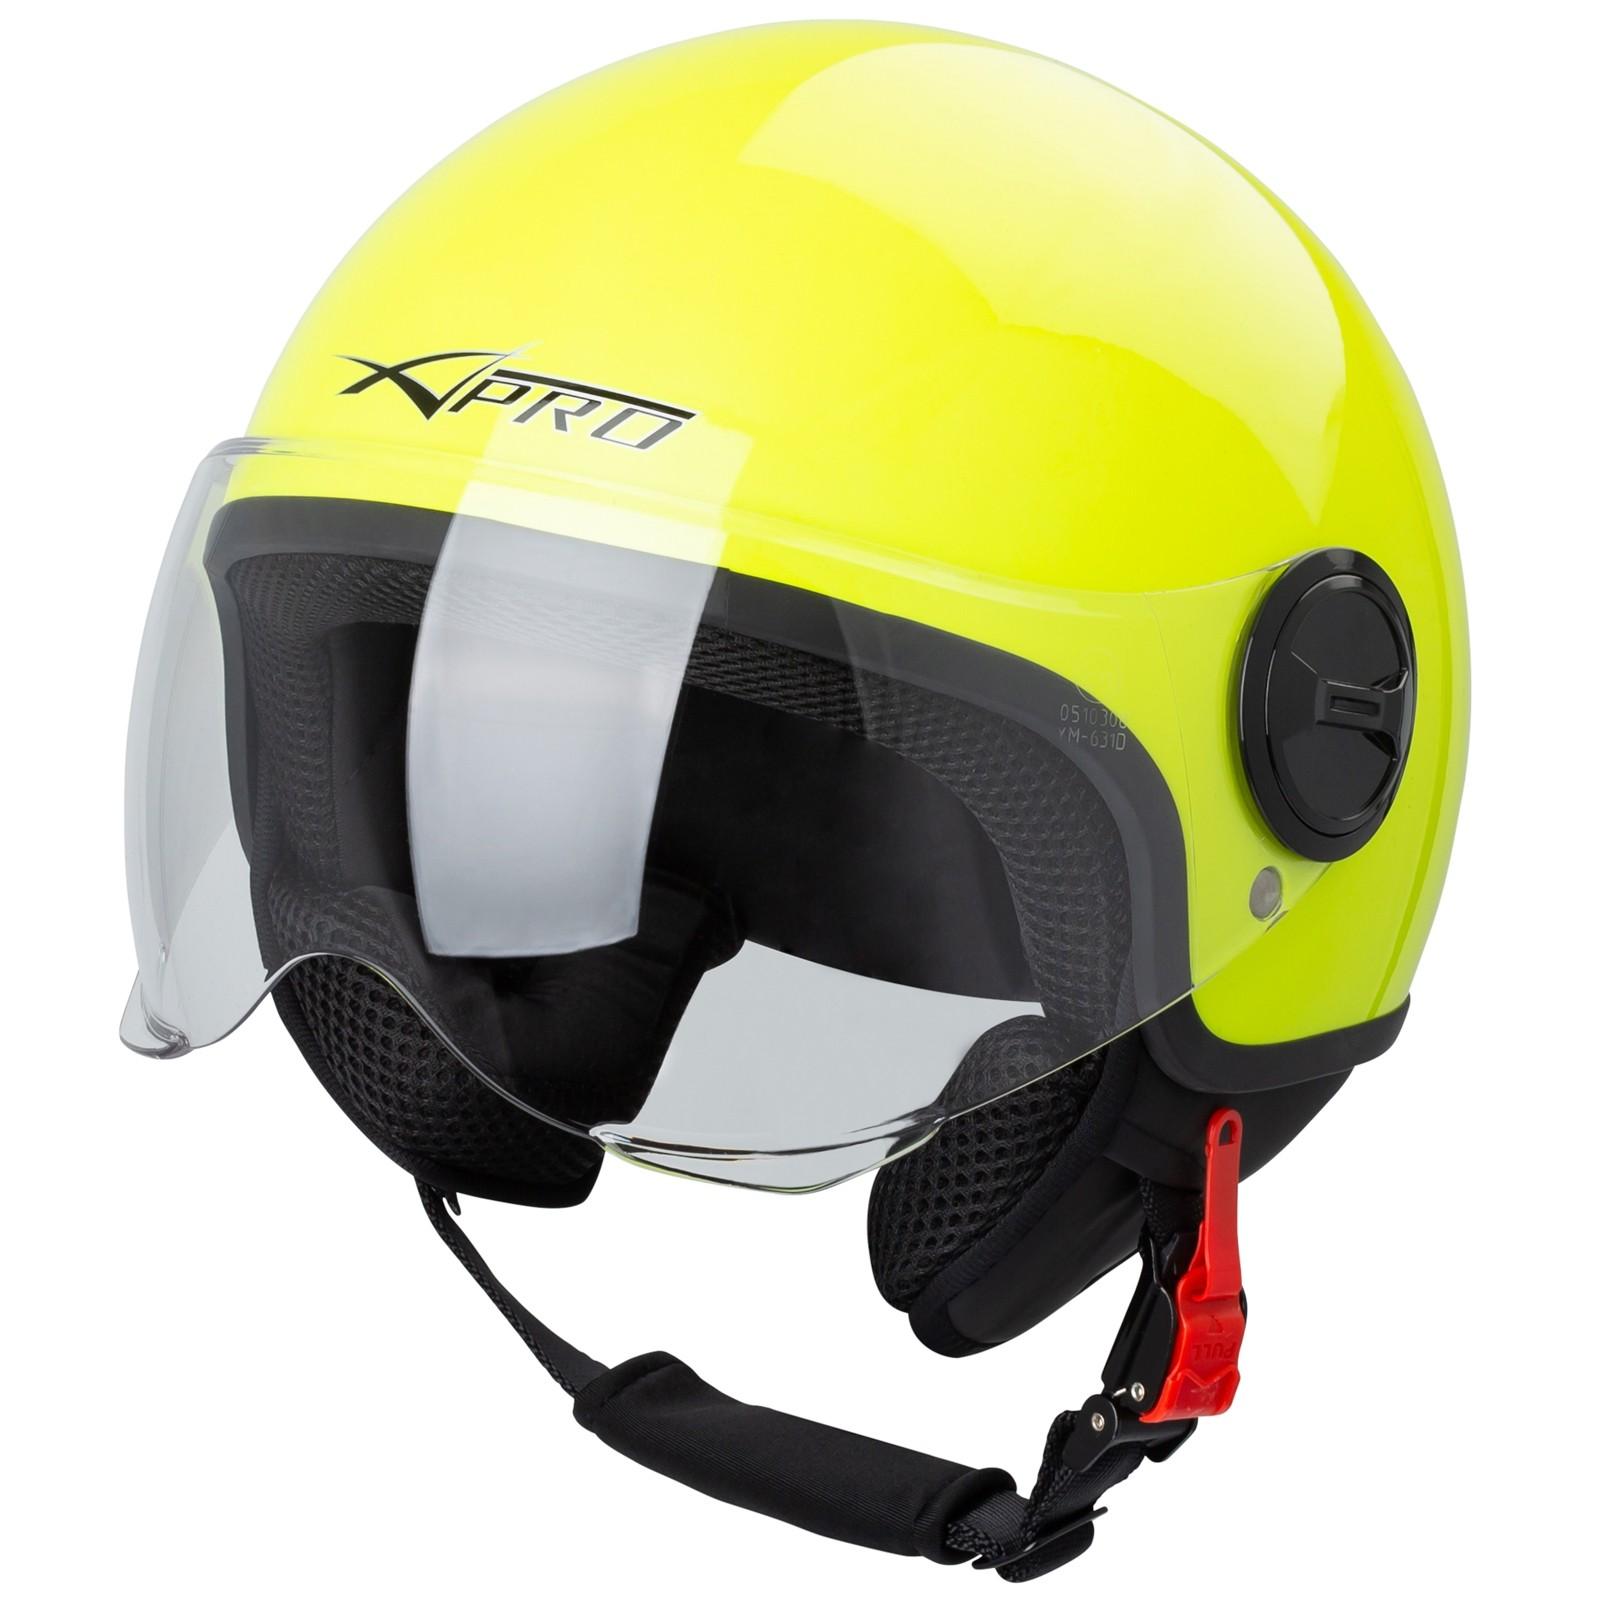 Demi Jet Helmet Moped Motorbike Scooter Visor SonicMoto Fluo XS